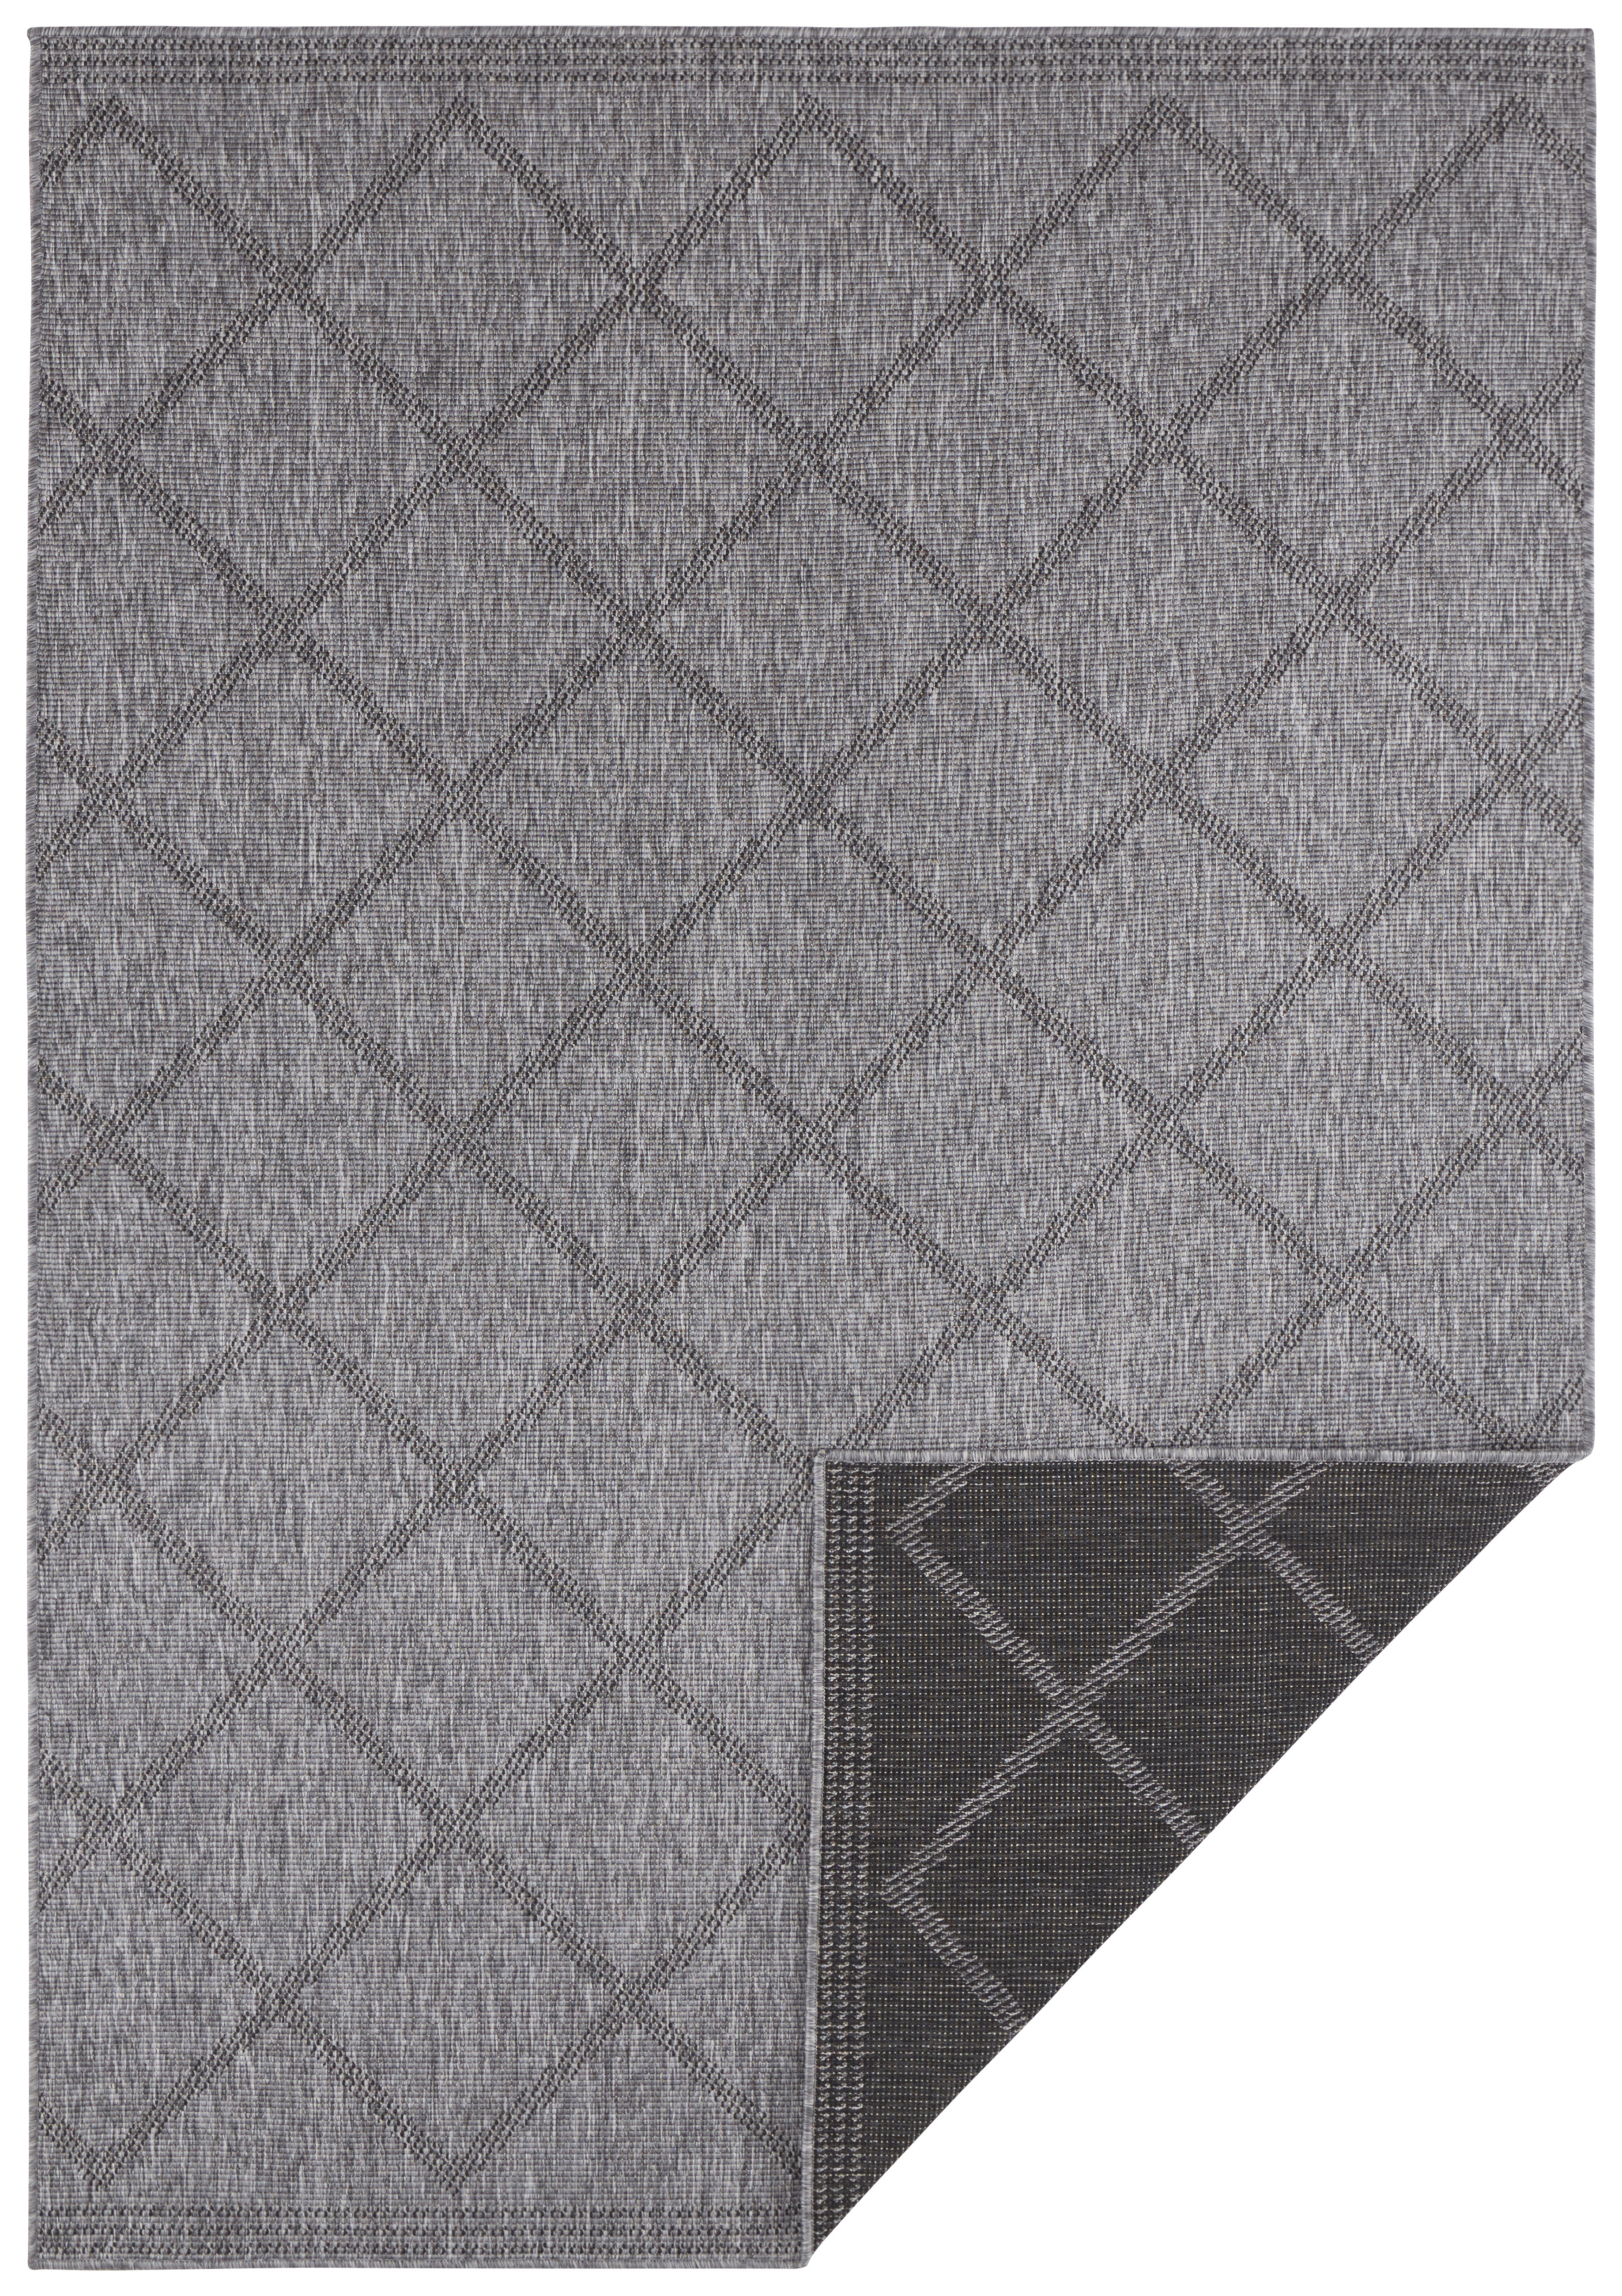 Bougari - Hanse Home koberce Kusový koberec Twin Supreme 103757 Black/Anthracite - 160x230 cm